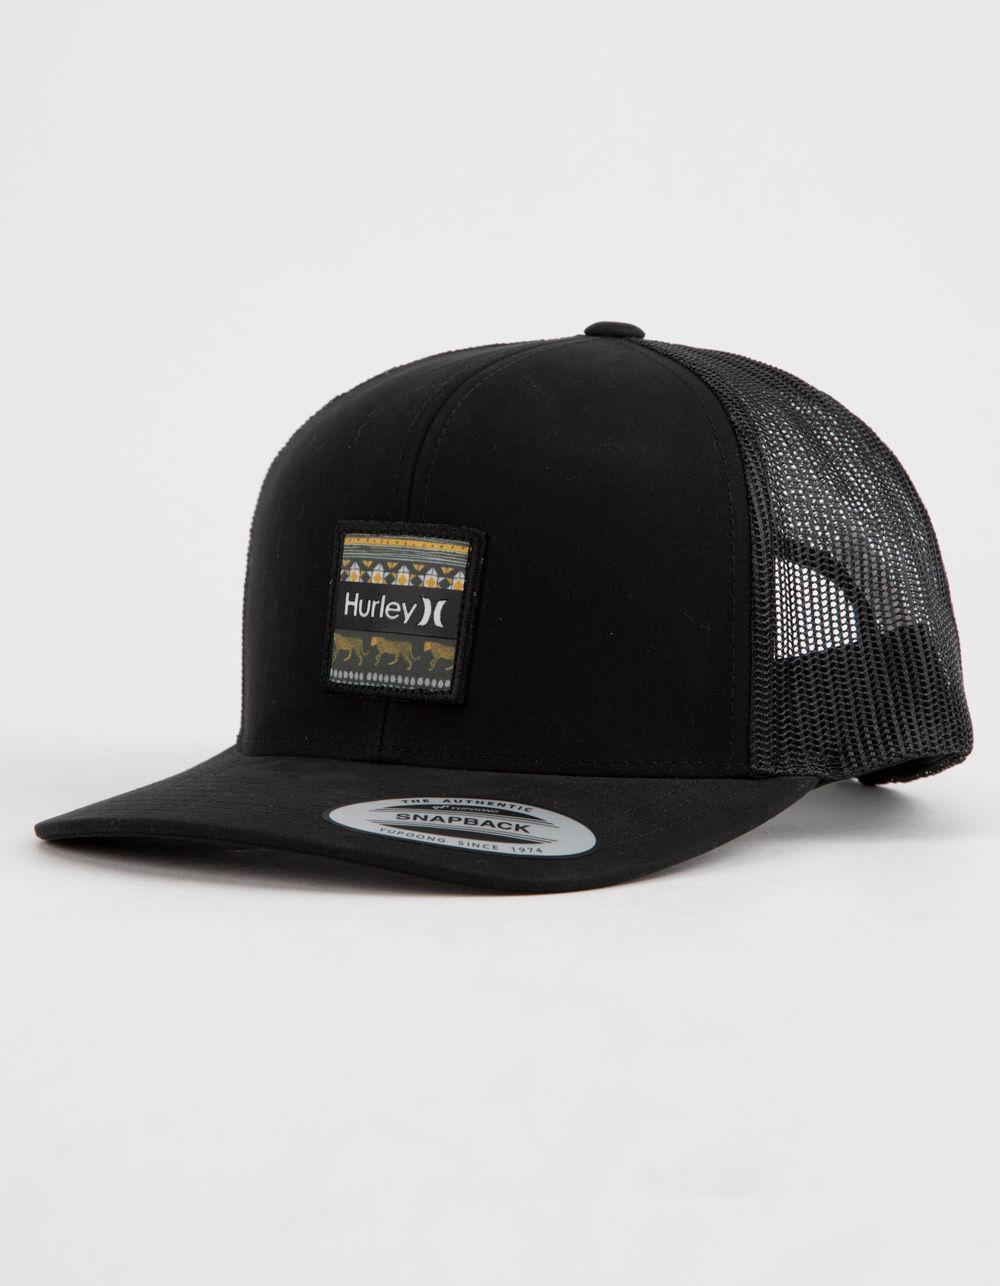 Hurley - Black Bayside Mens Trucker Hat for Men - Lyst. View fullscreen 7ba2895ee79c